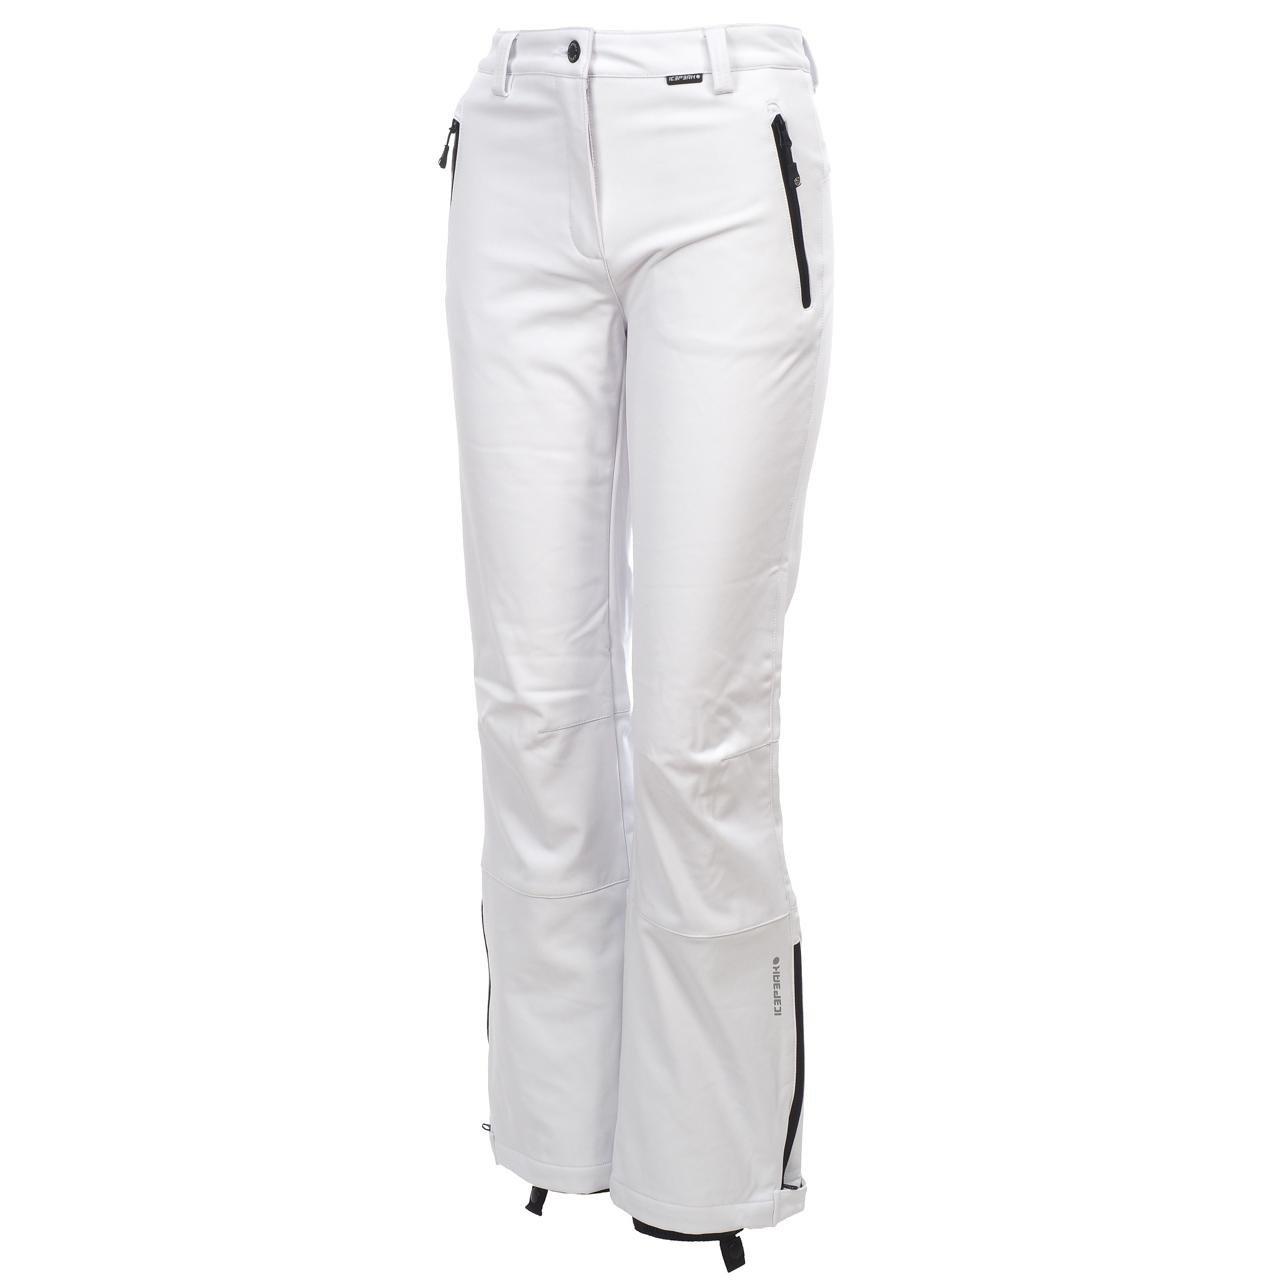 Icepeak Risku blc lady-Pantaloni softshell da sci, surf